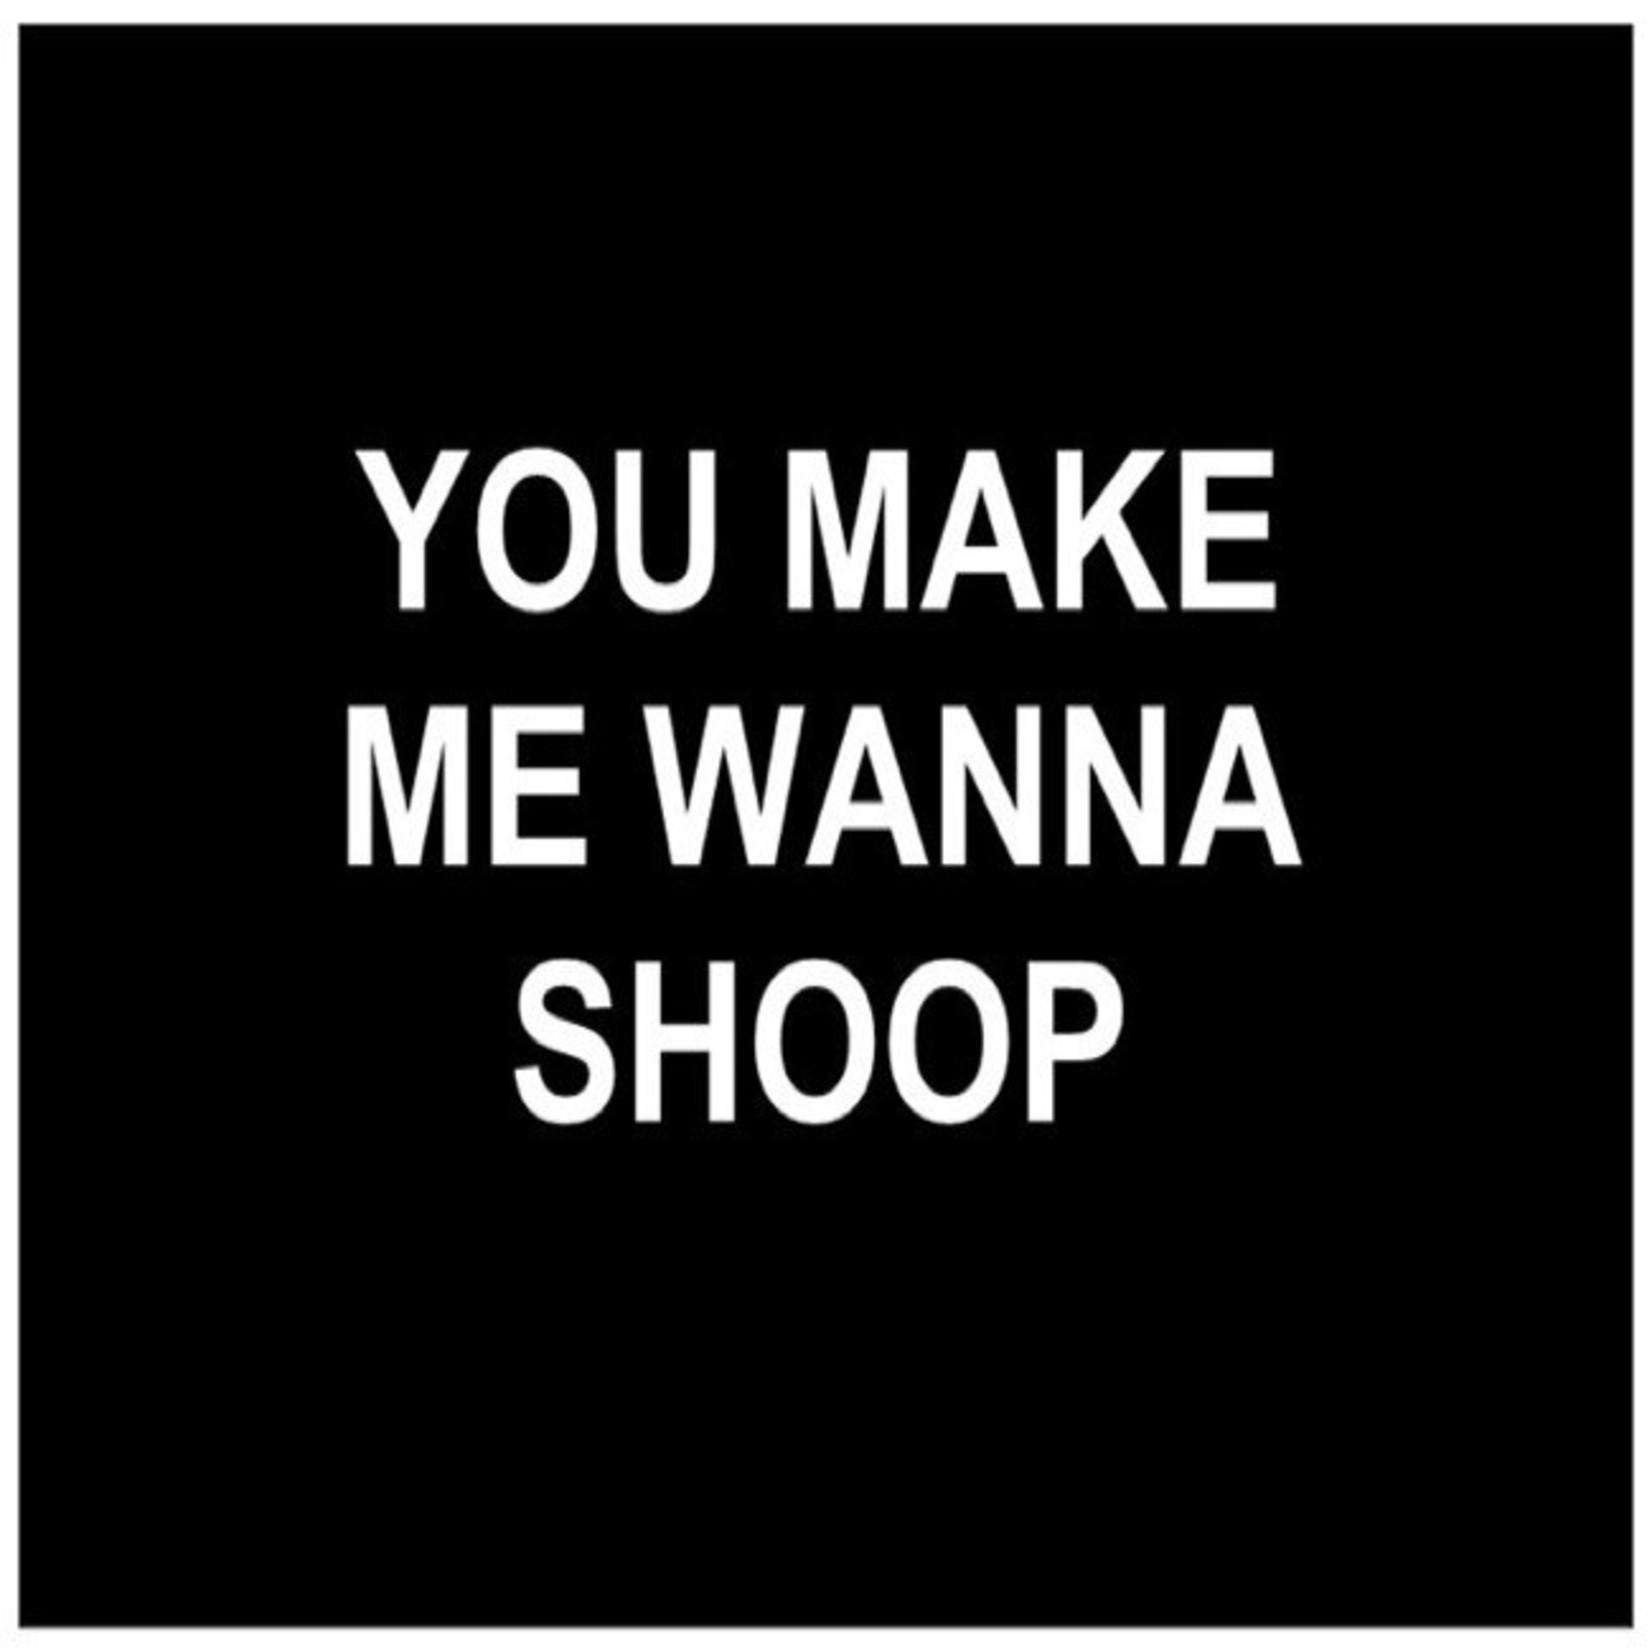 Bad Annie's Card #128 - You Make Me Wanna Shoop